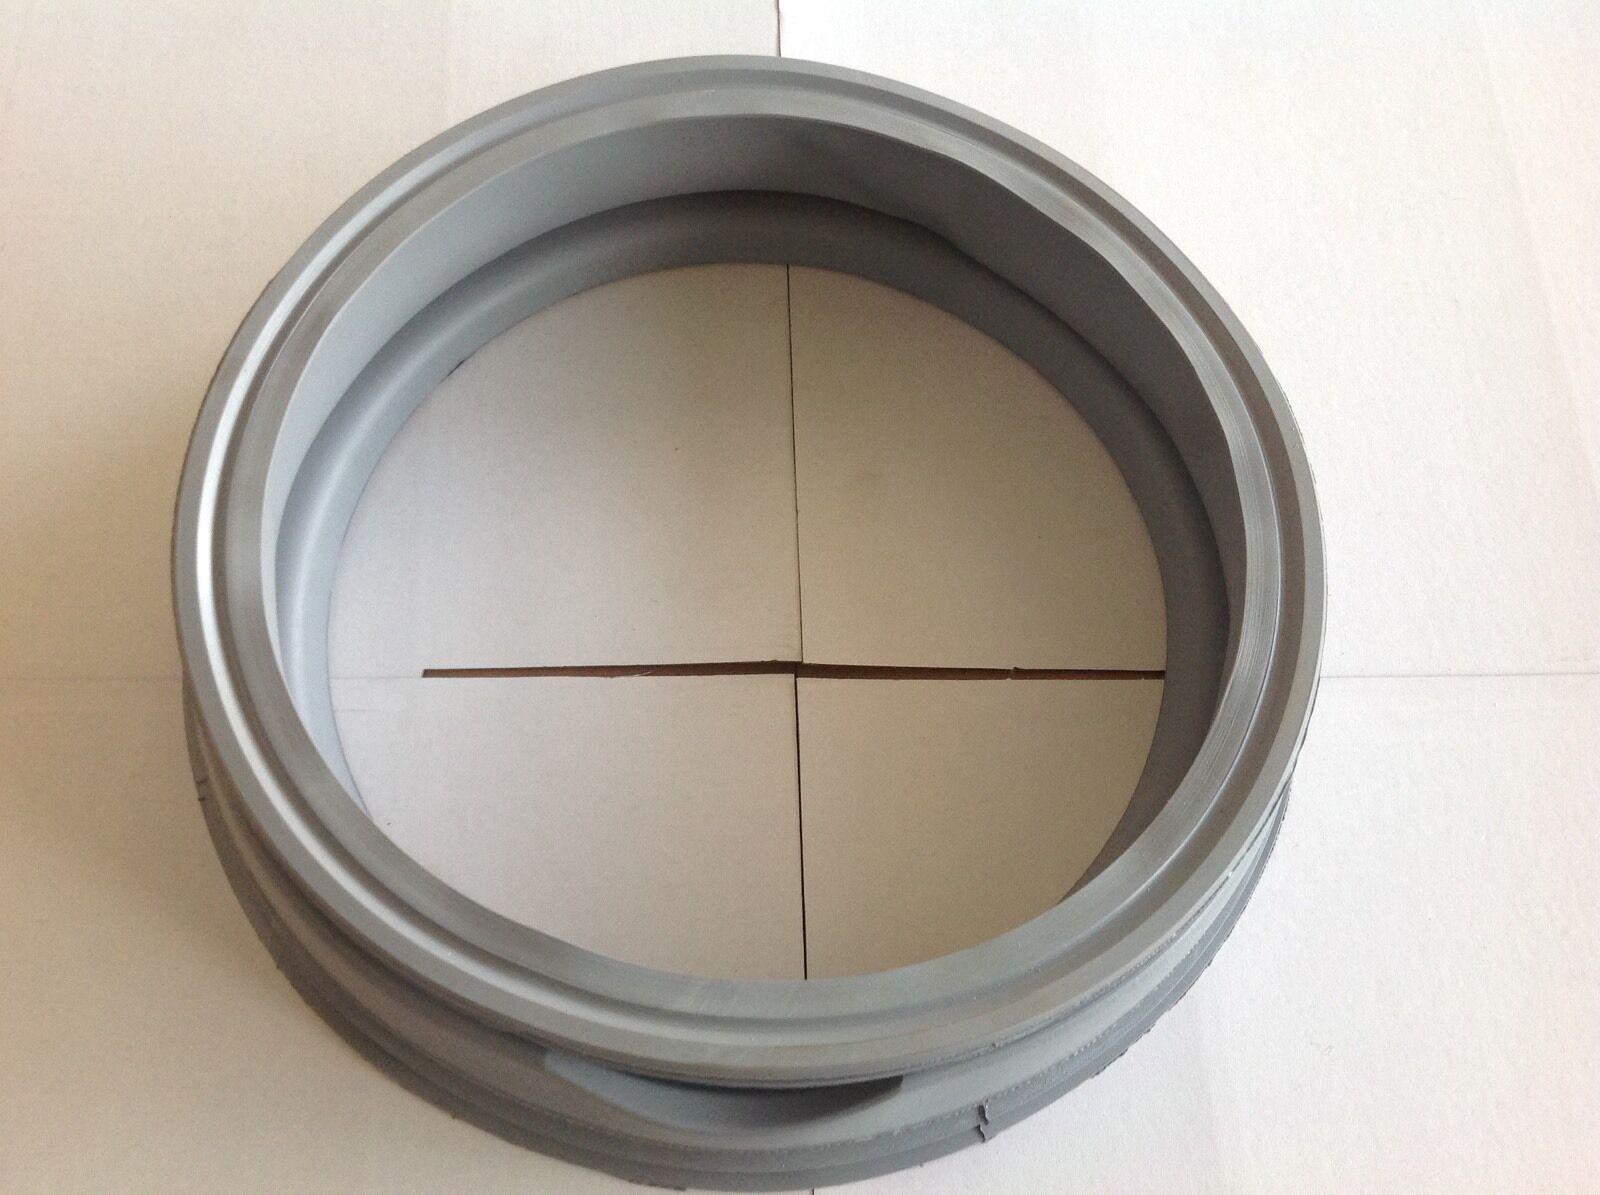 Bosch Maxx 1200 Washing Machine Door Boot Seal Gasket WFO2460AU/16 WFO2460AU/18